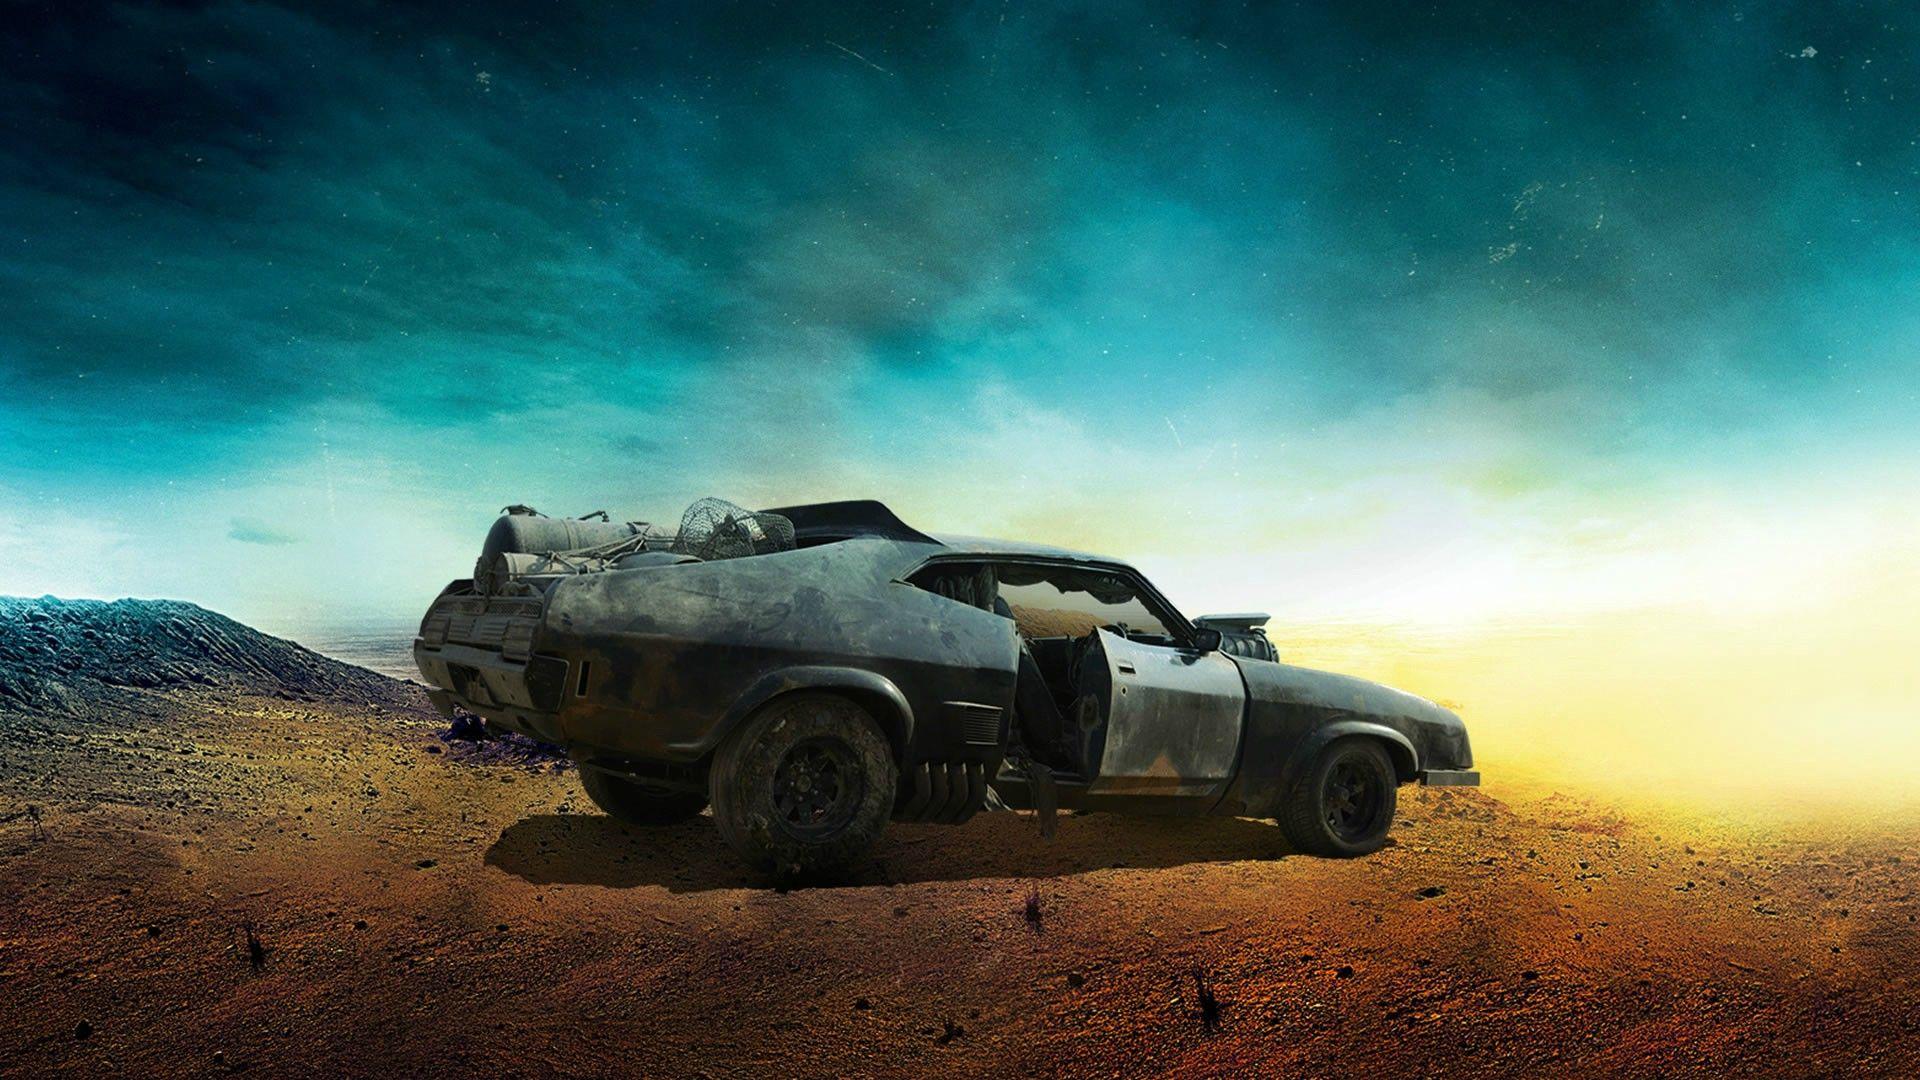 Interceptor Mad Max Mad Max Fury Road Mad Max Fury Road Cars